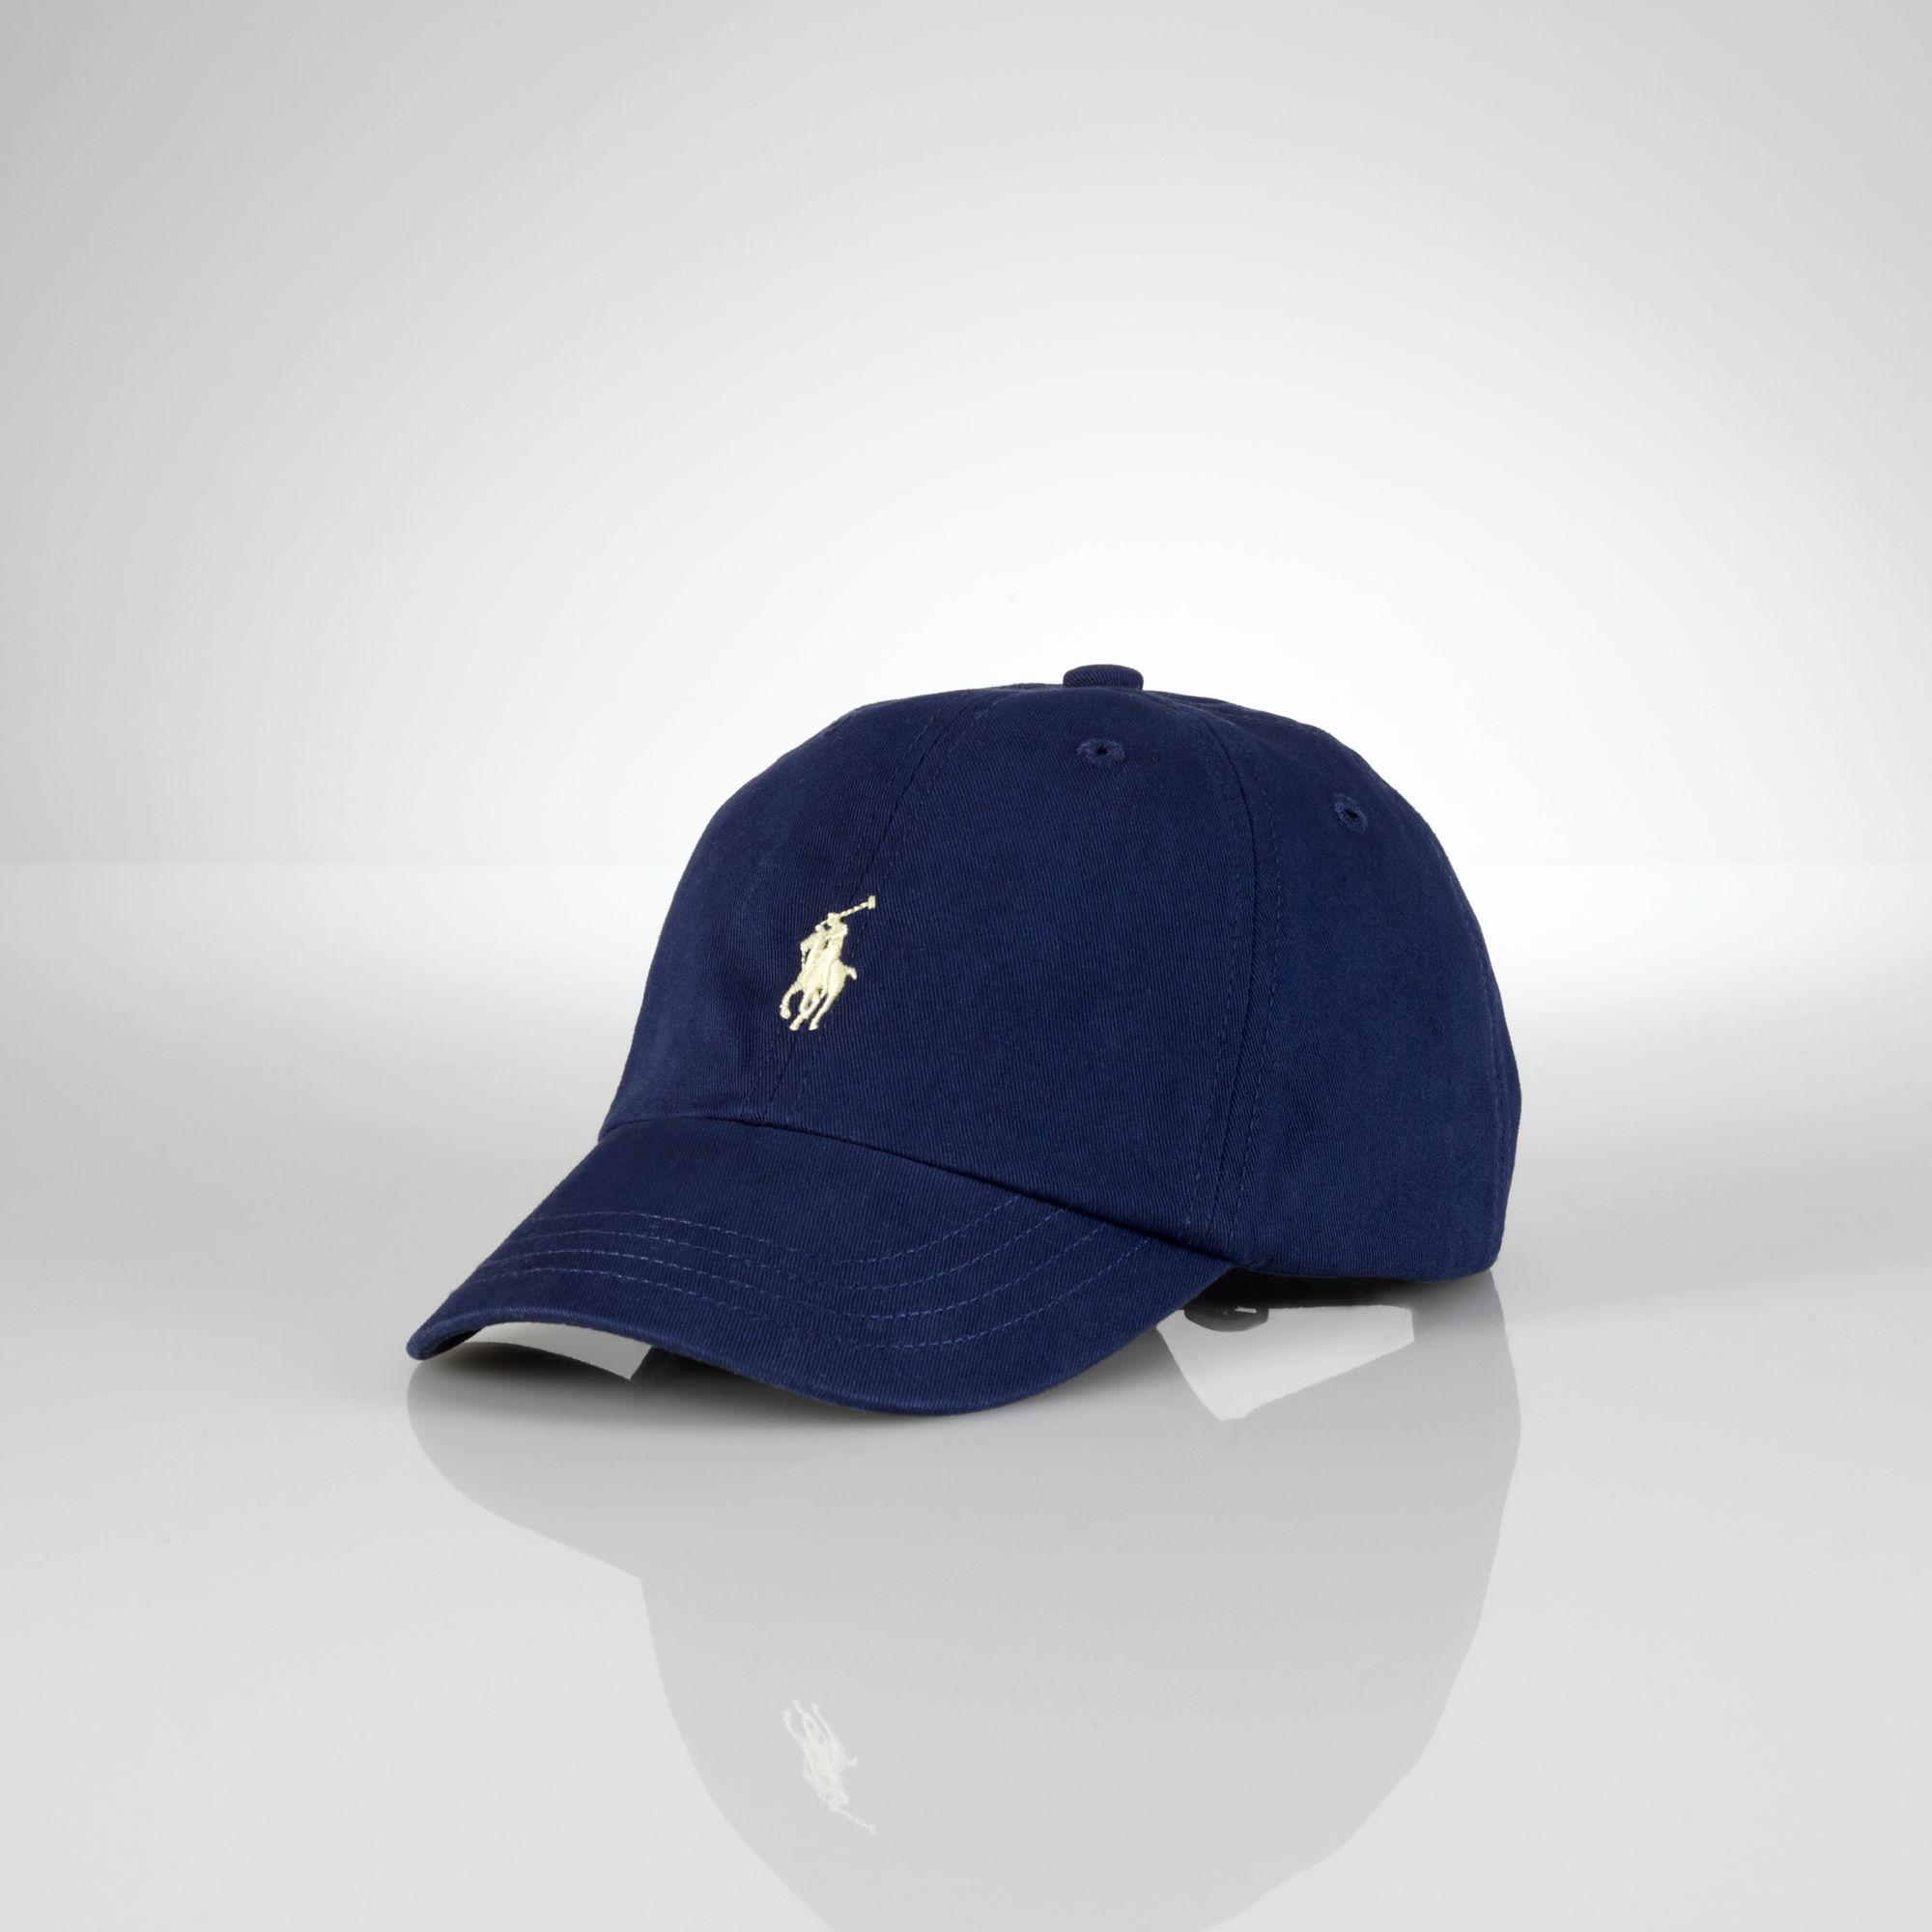 95027efcbc7 Ralph Lauren Classic Pony Baseball Cap in Blue for Men - Lyst